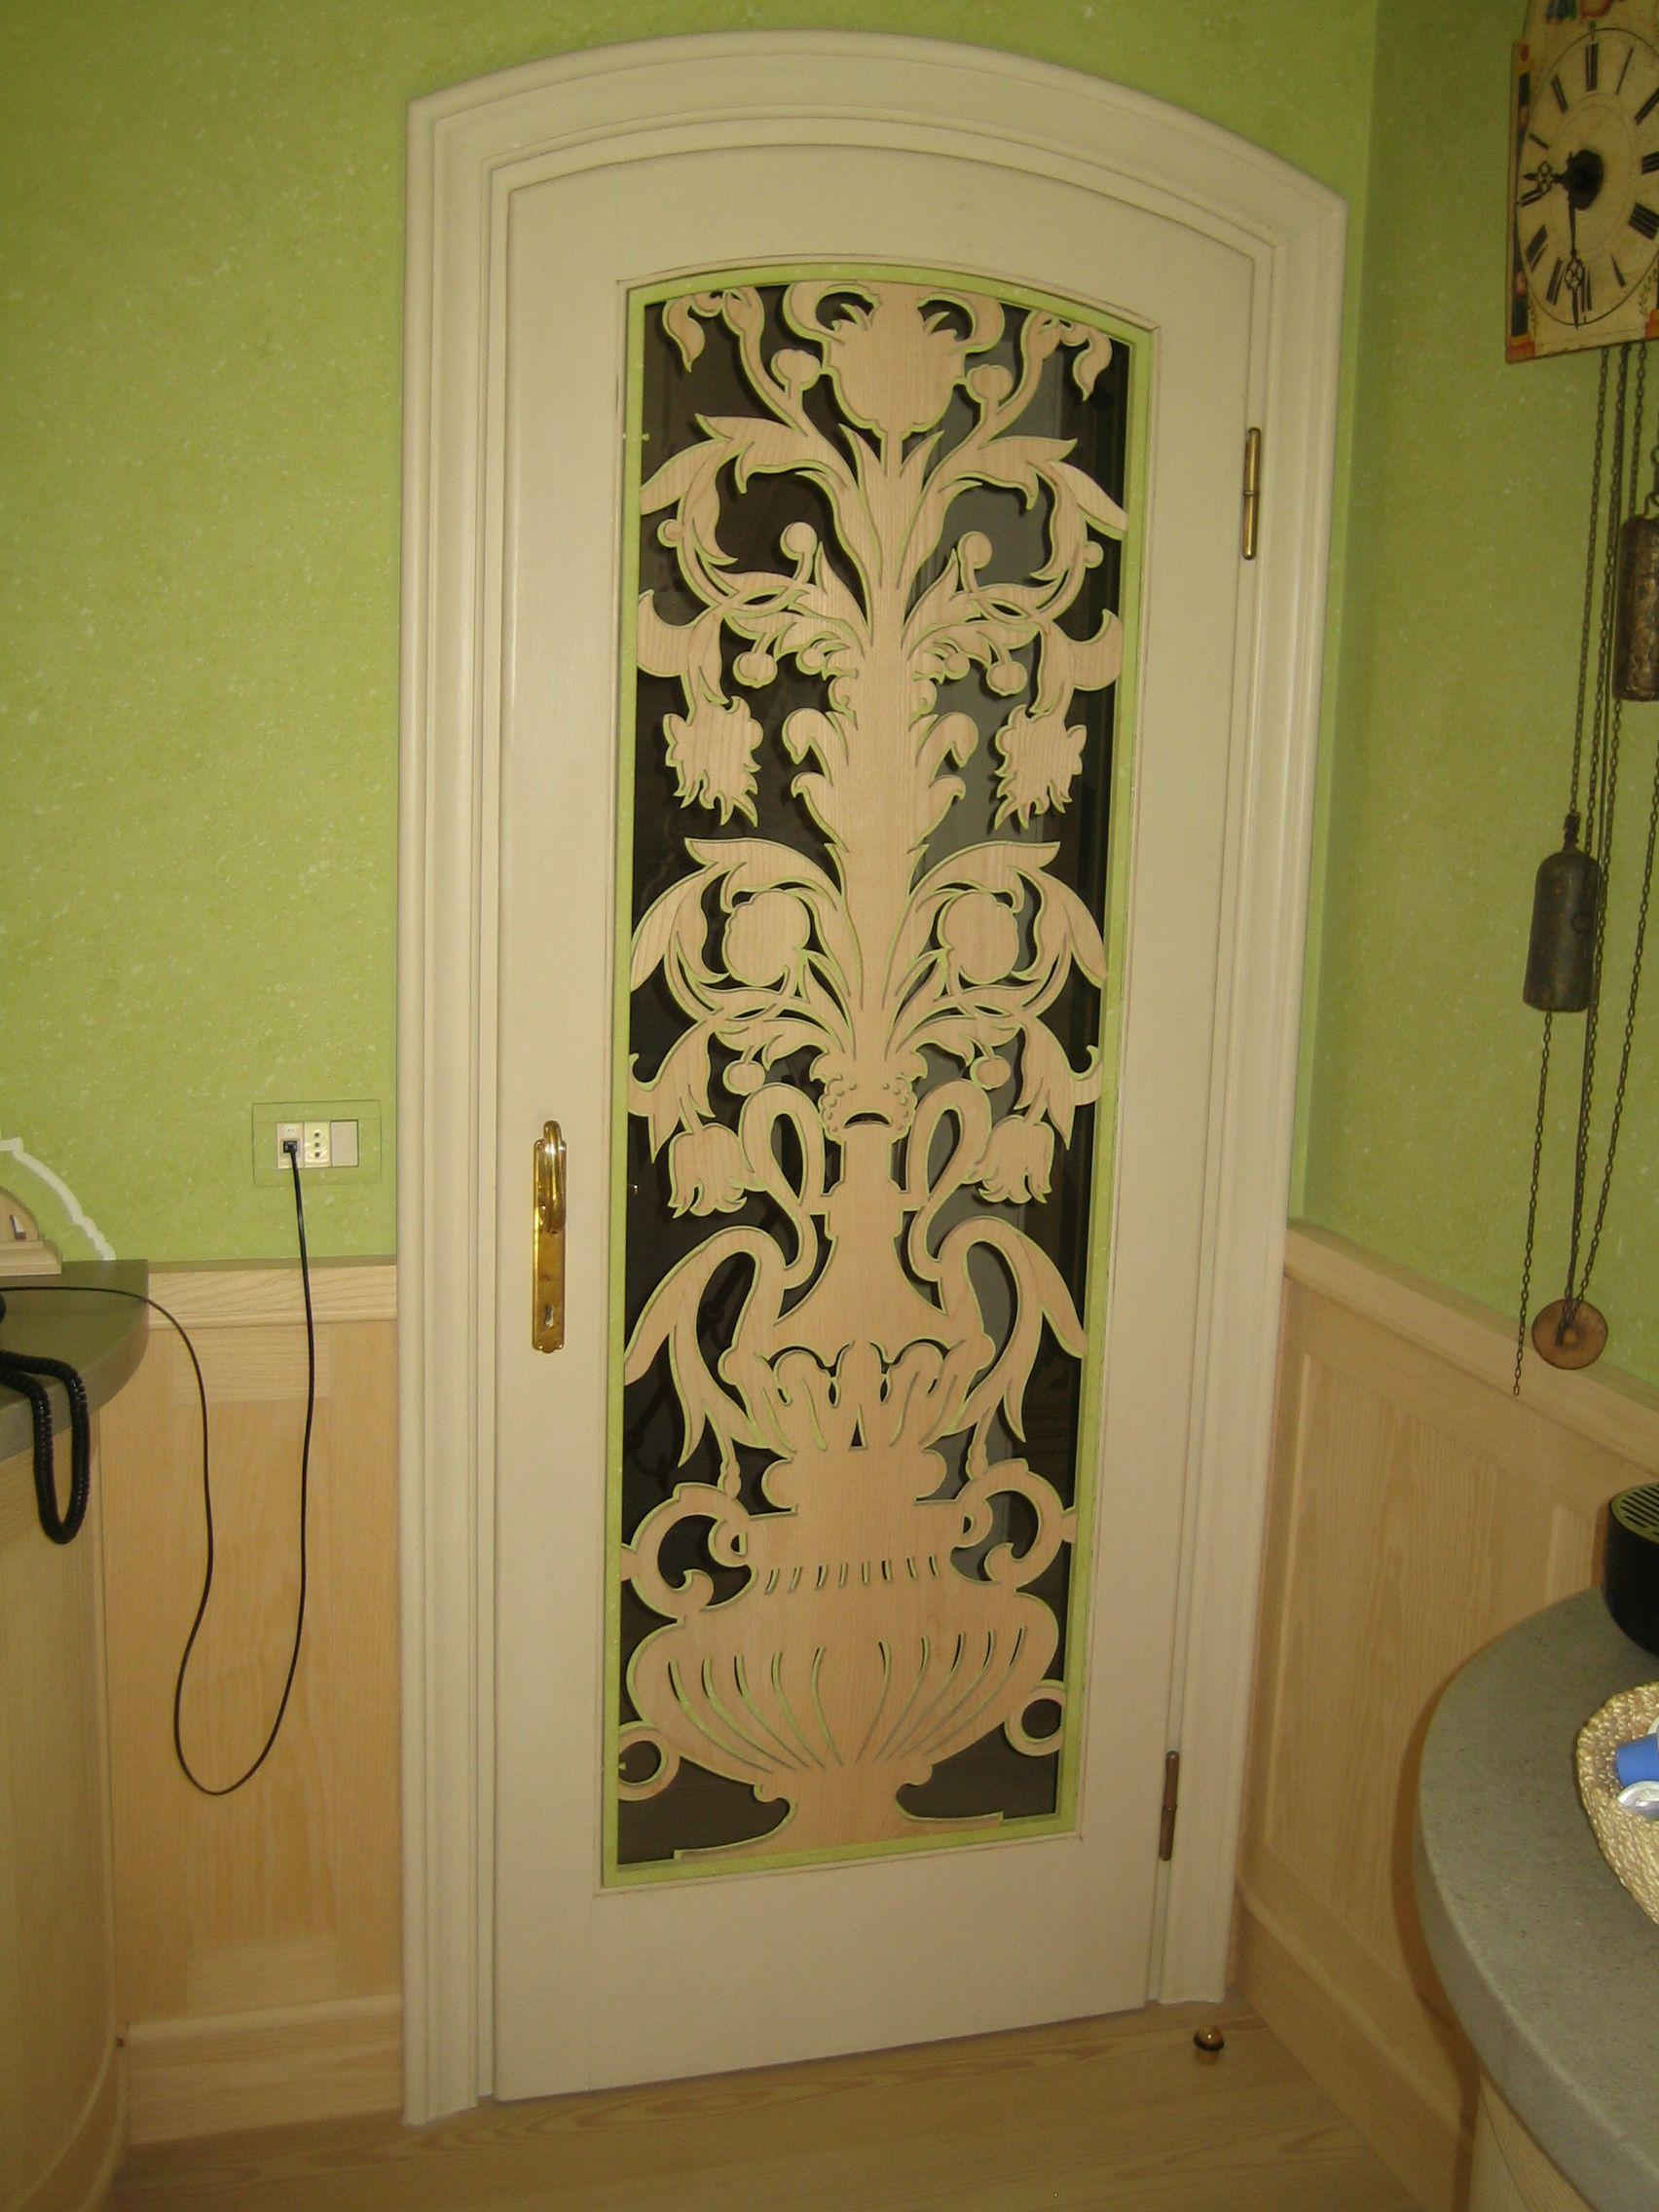 15 Porta con intarsi_arr_ita.jpg (1704×2272)